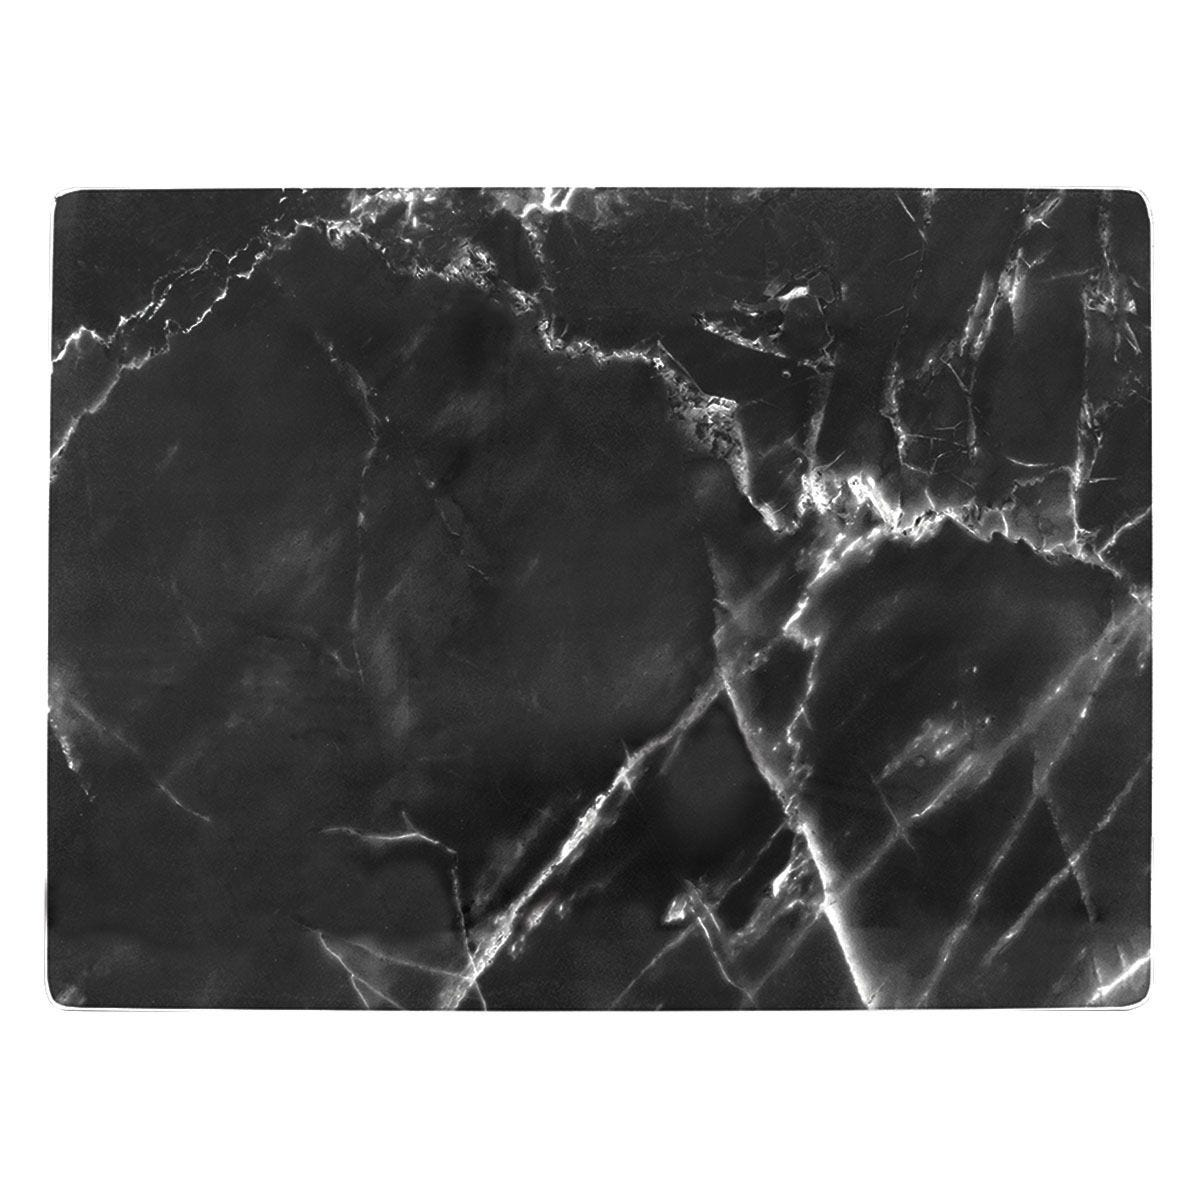 Black Marble Effect Glass Worktop Saver